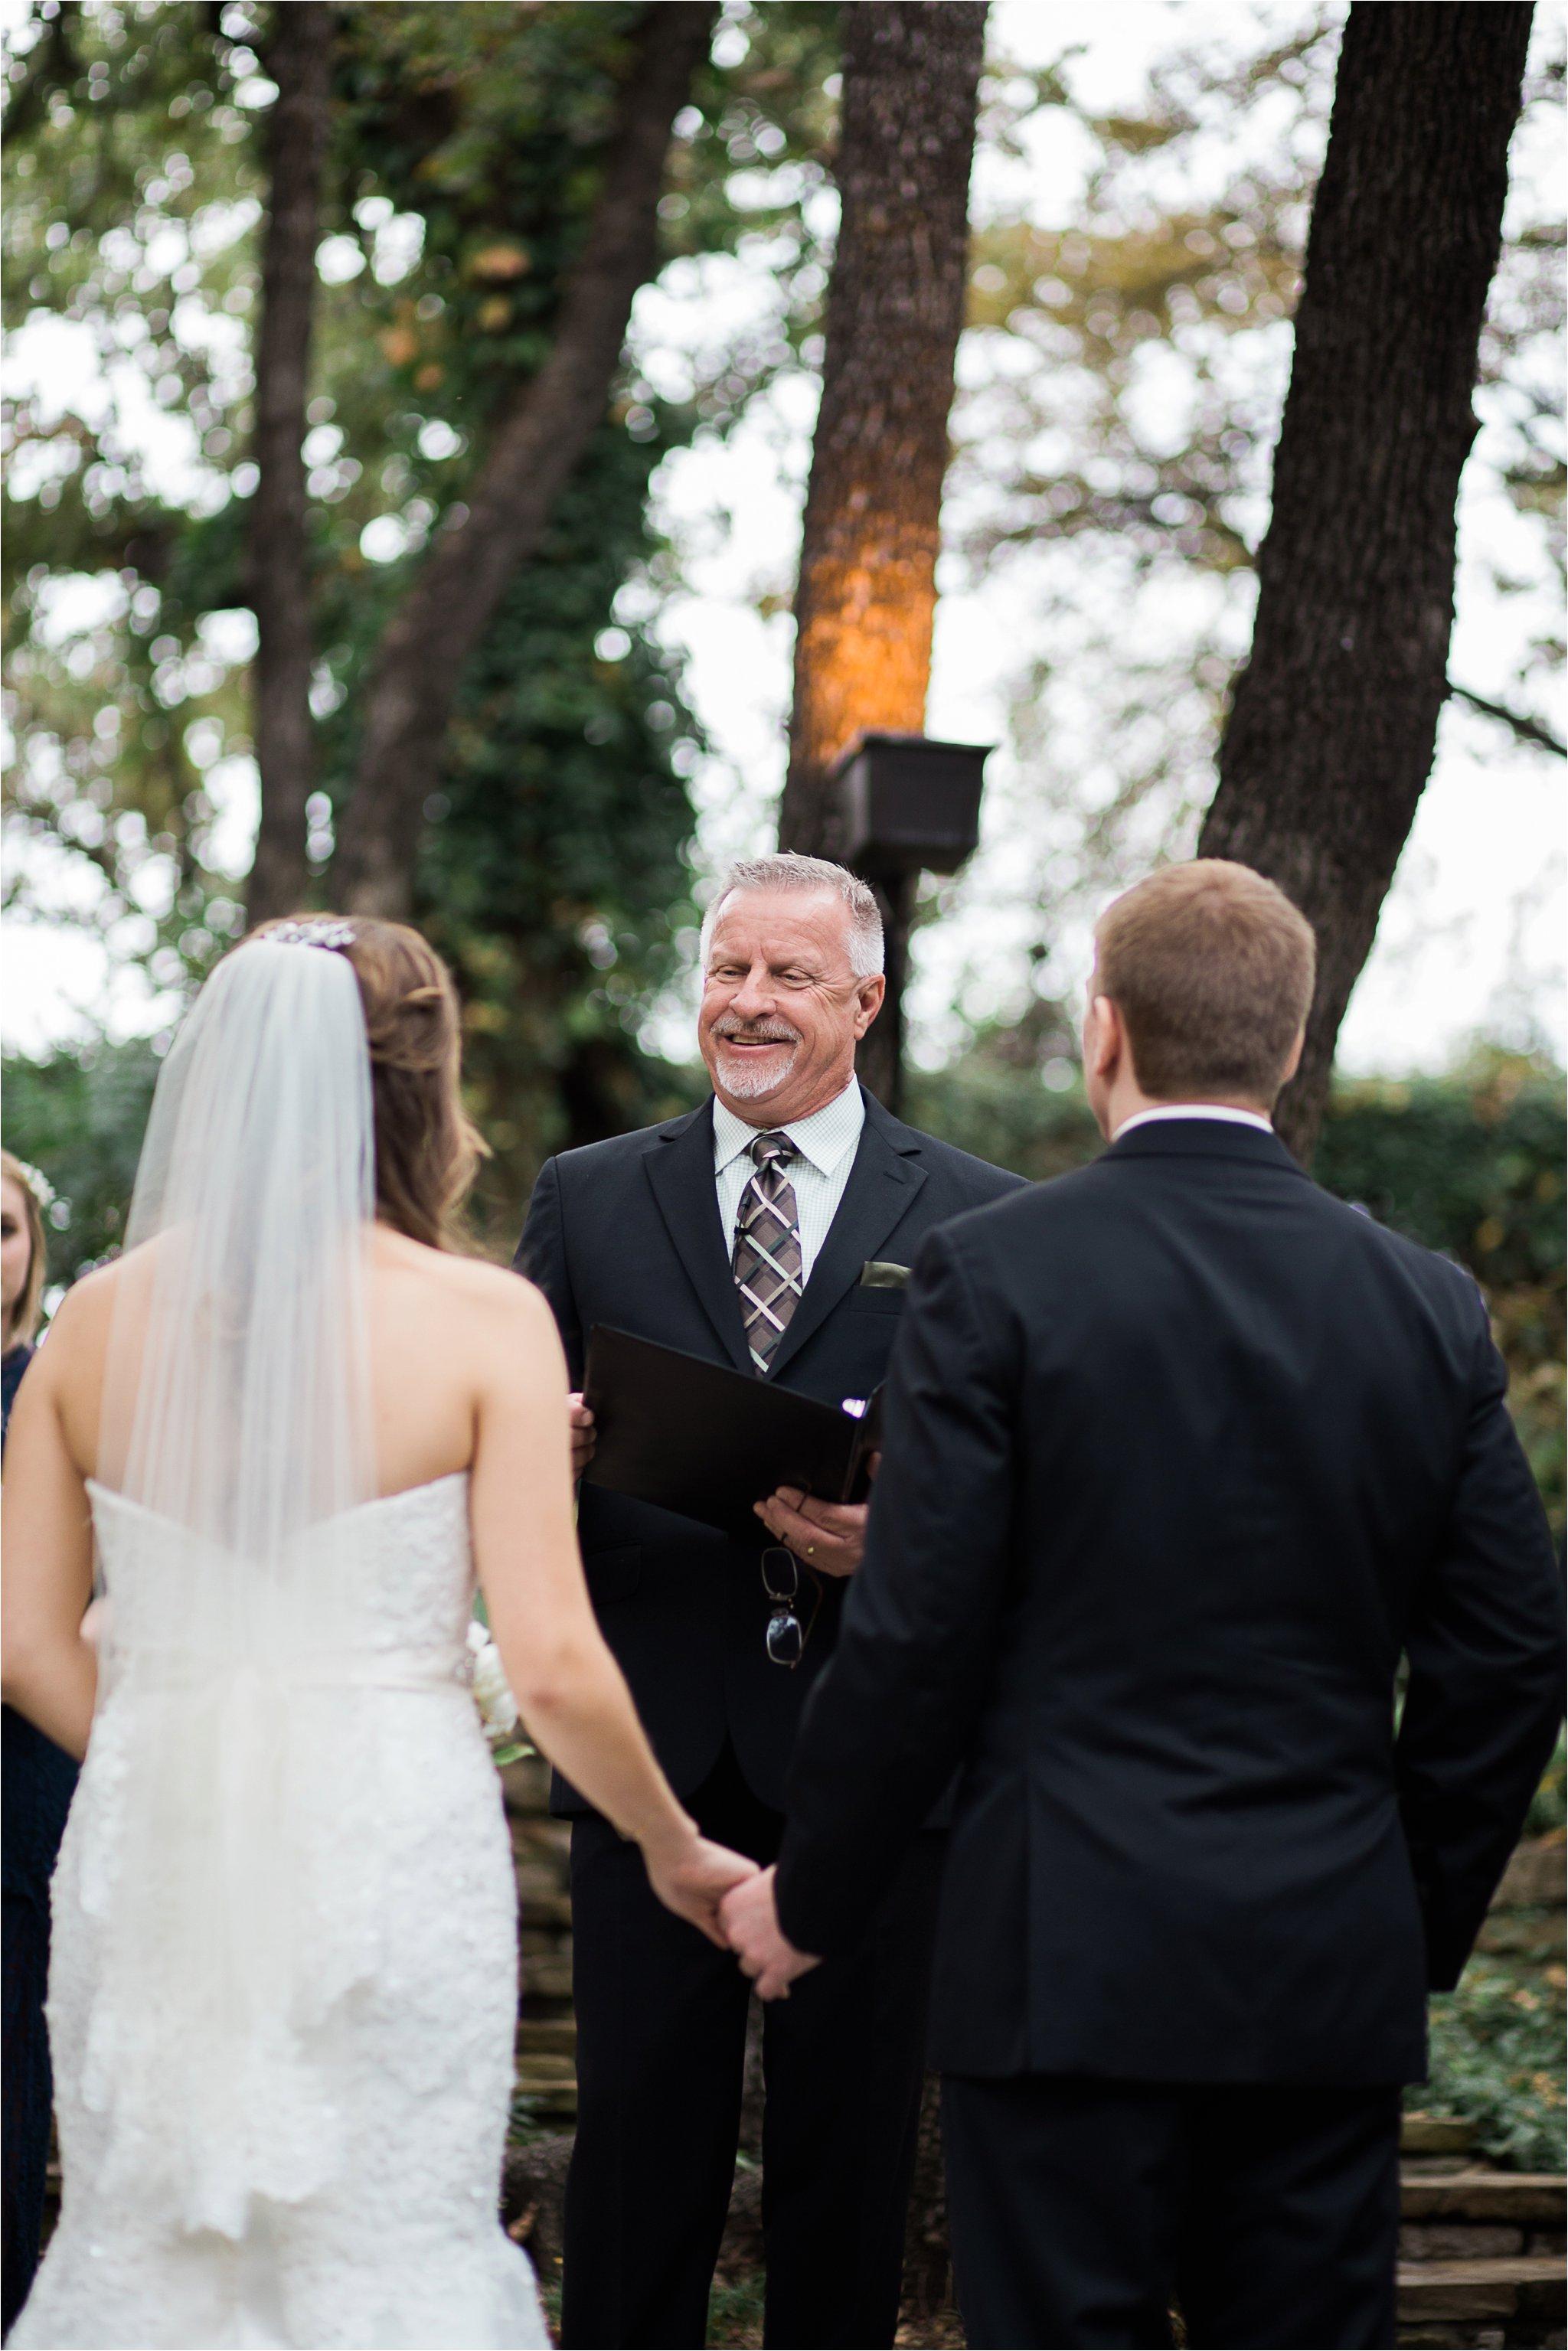 lunsford-wedding-539.jpg